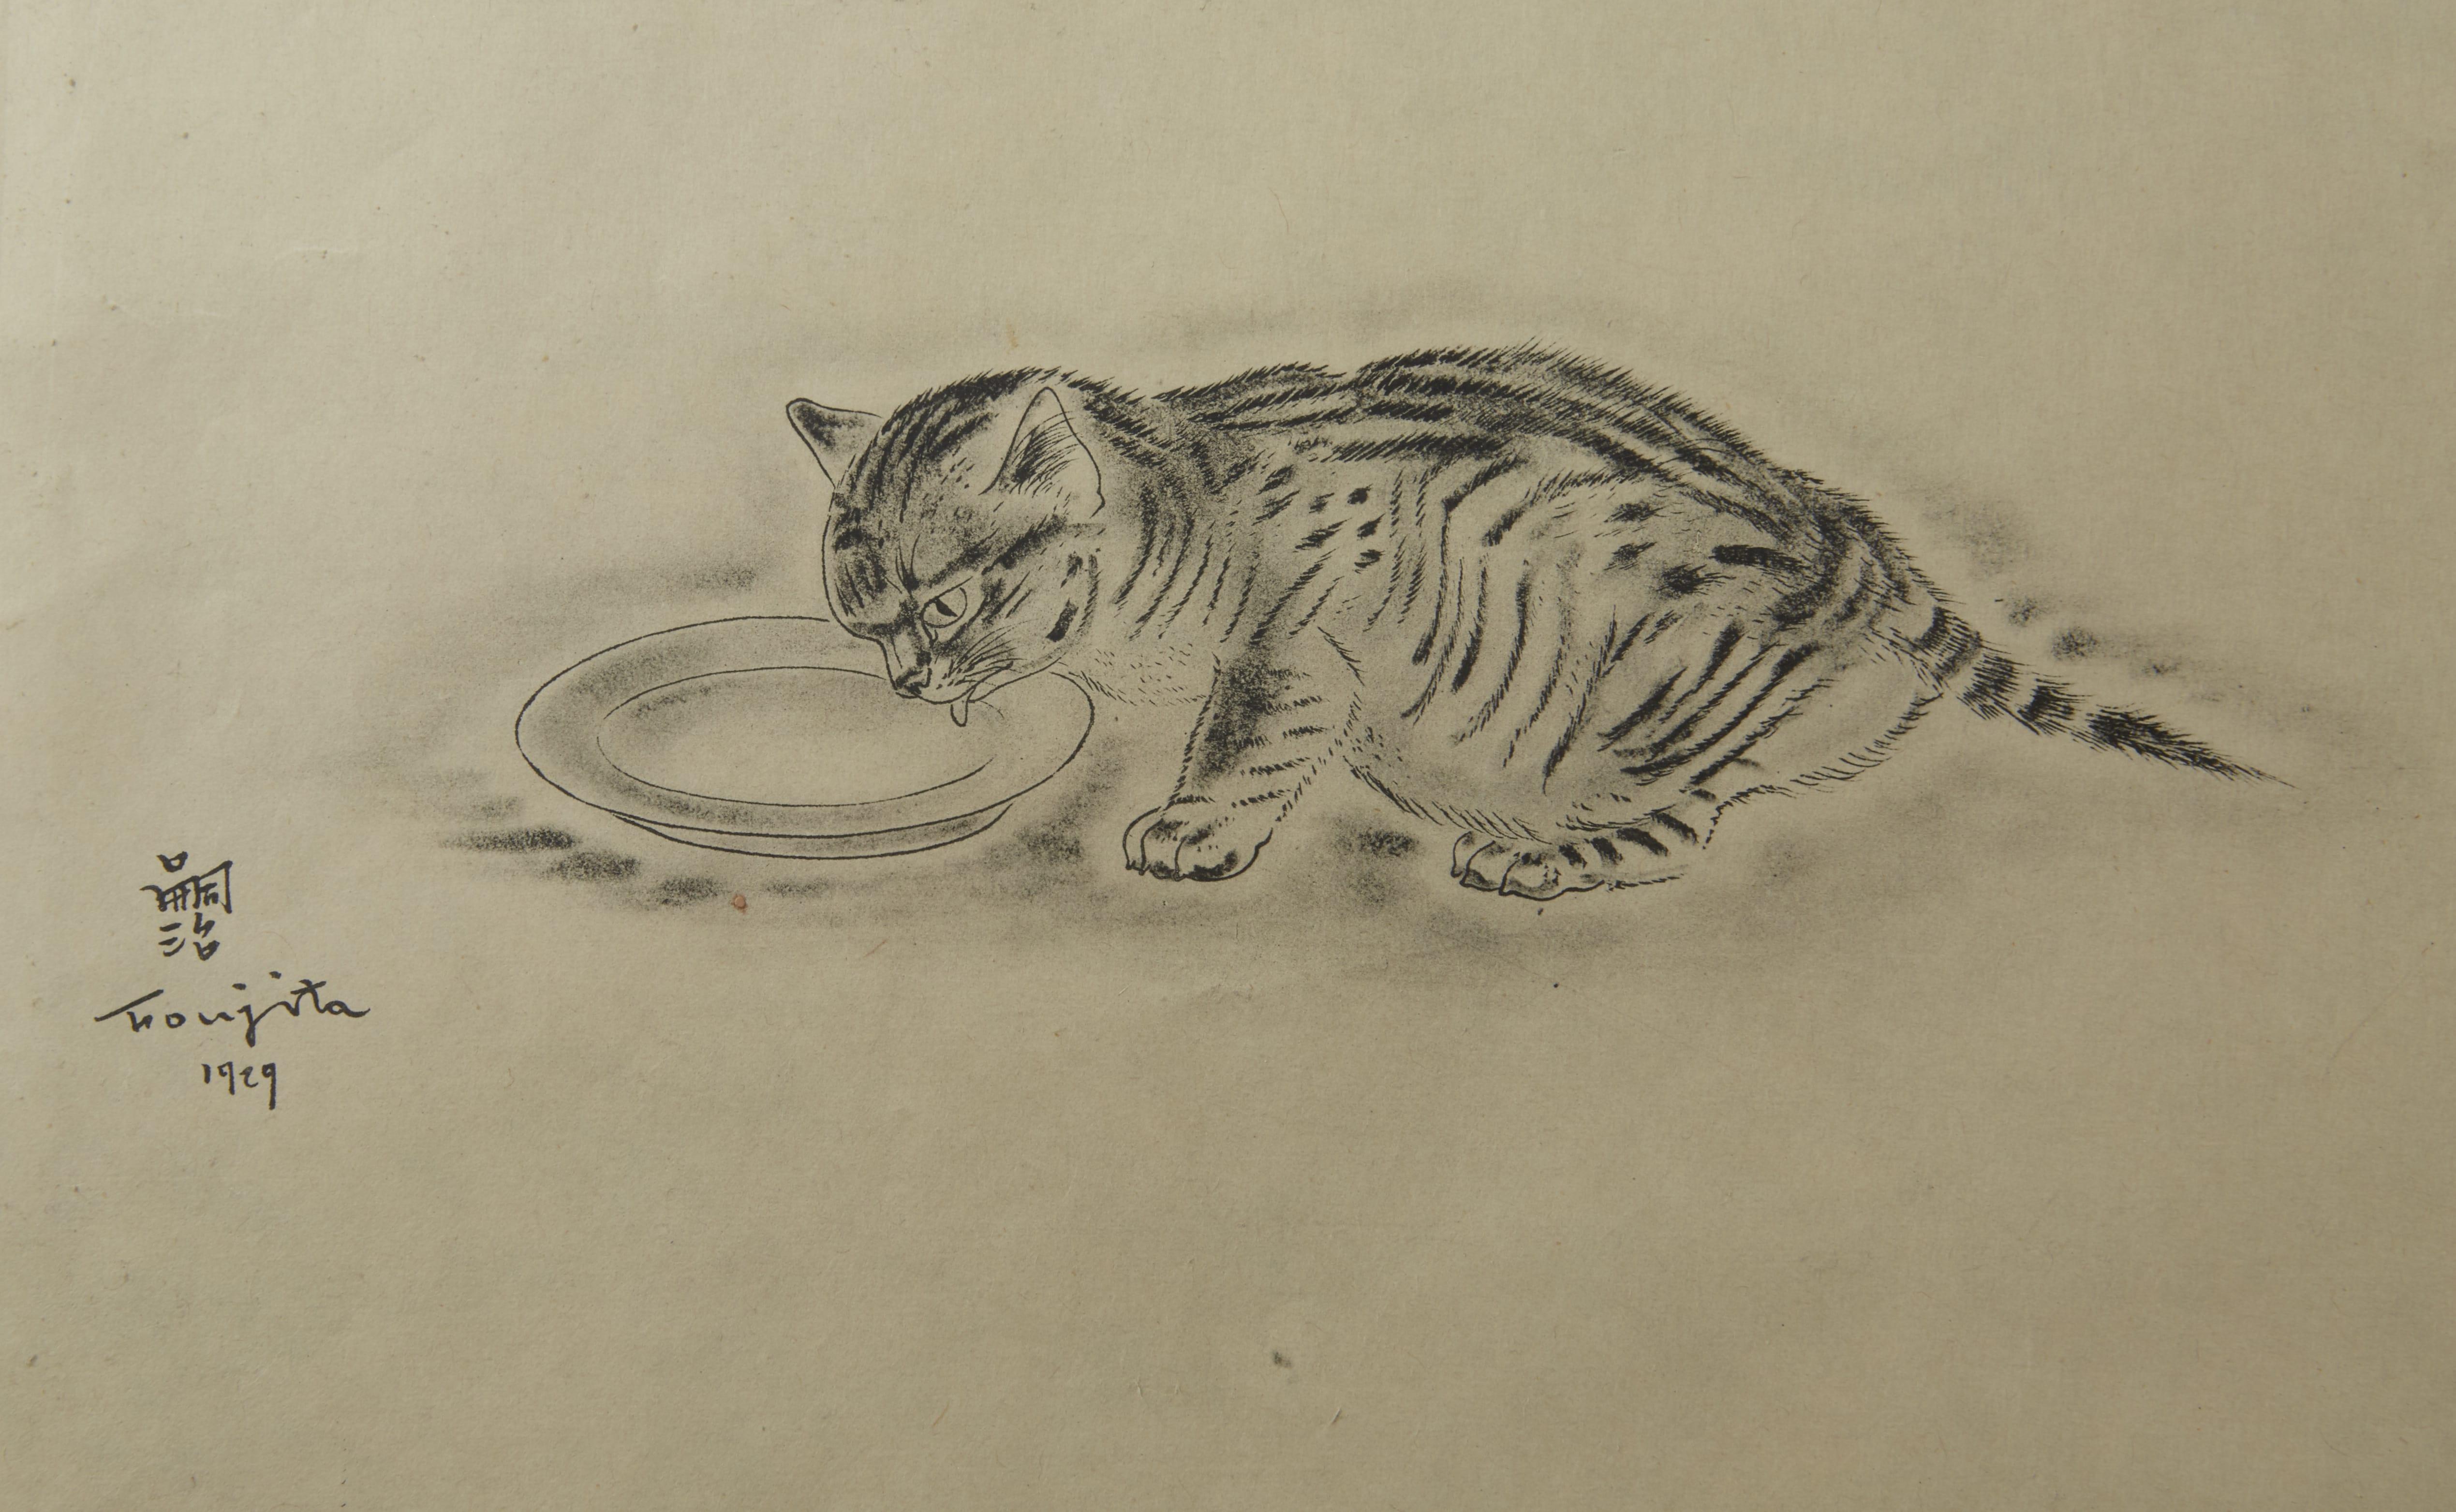 Lot 261: Leonard Tsuguharu Foujita Collotype Print Book of Cats